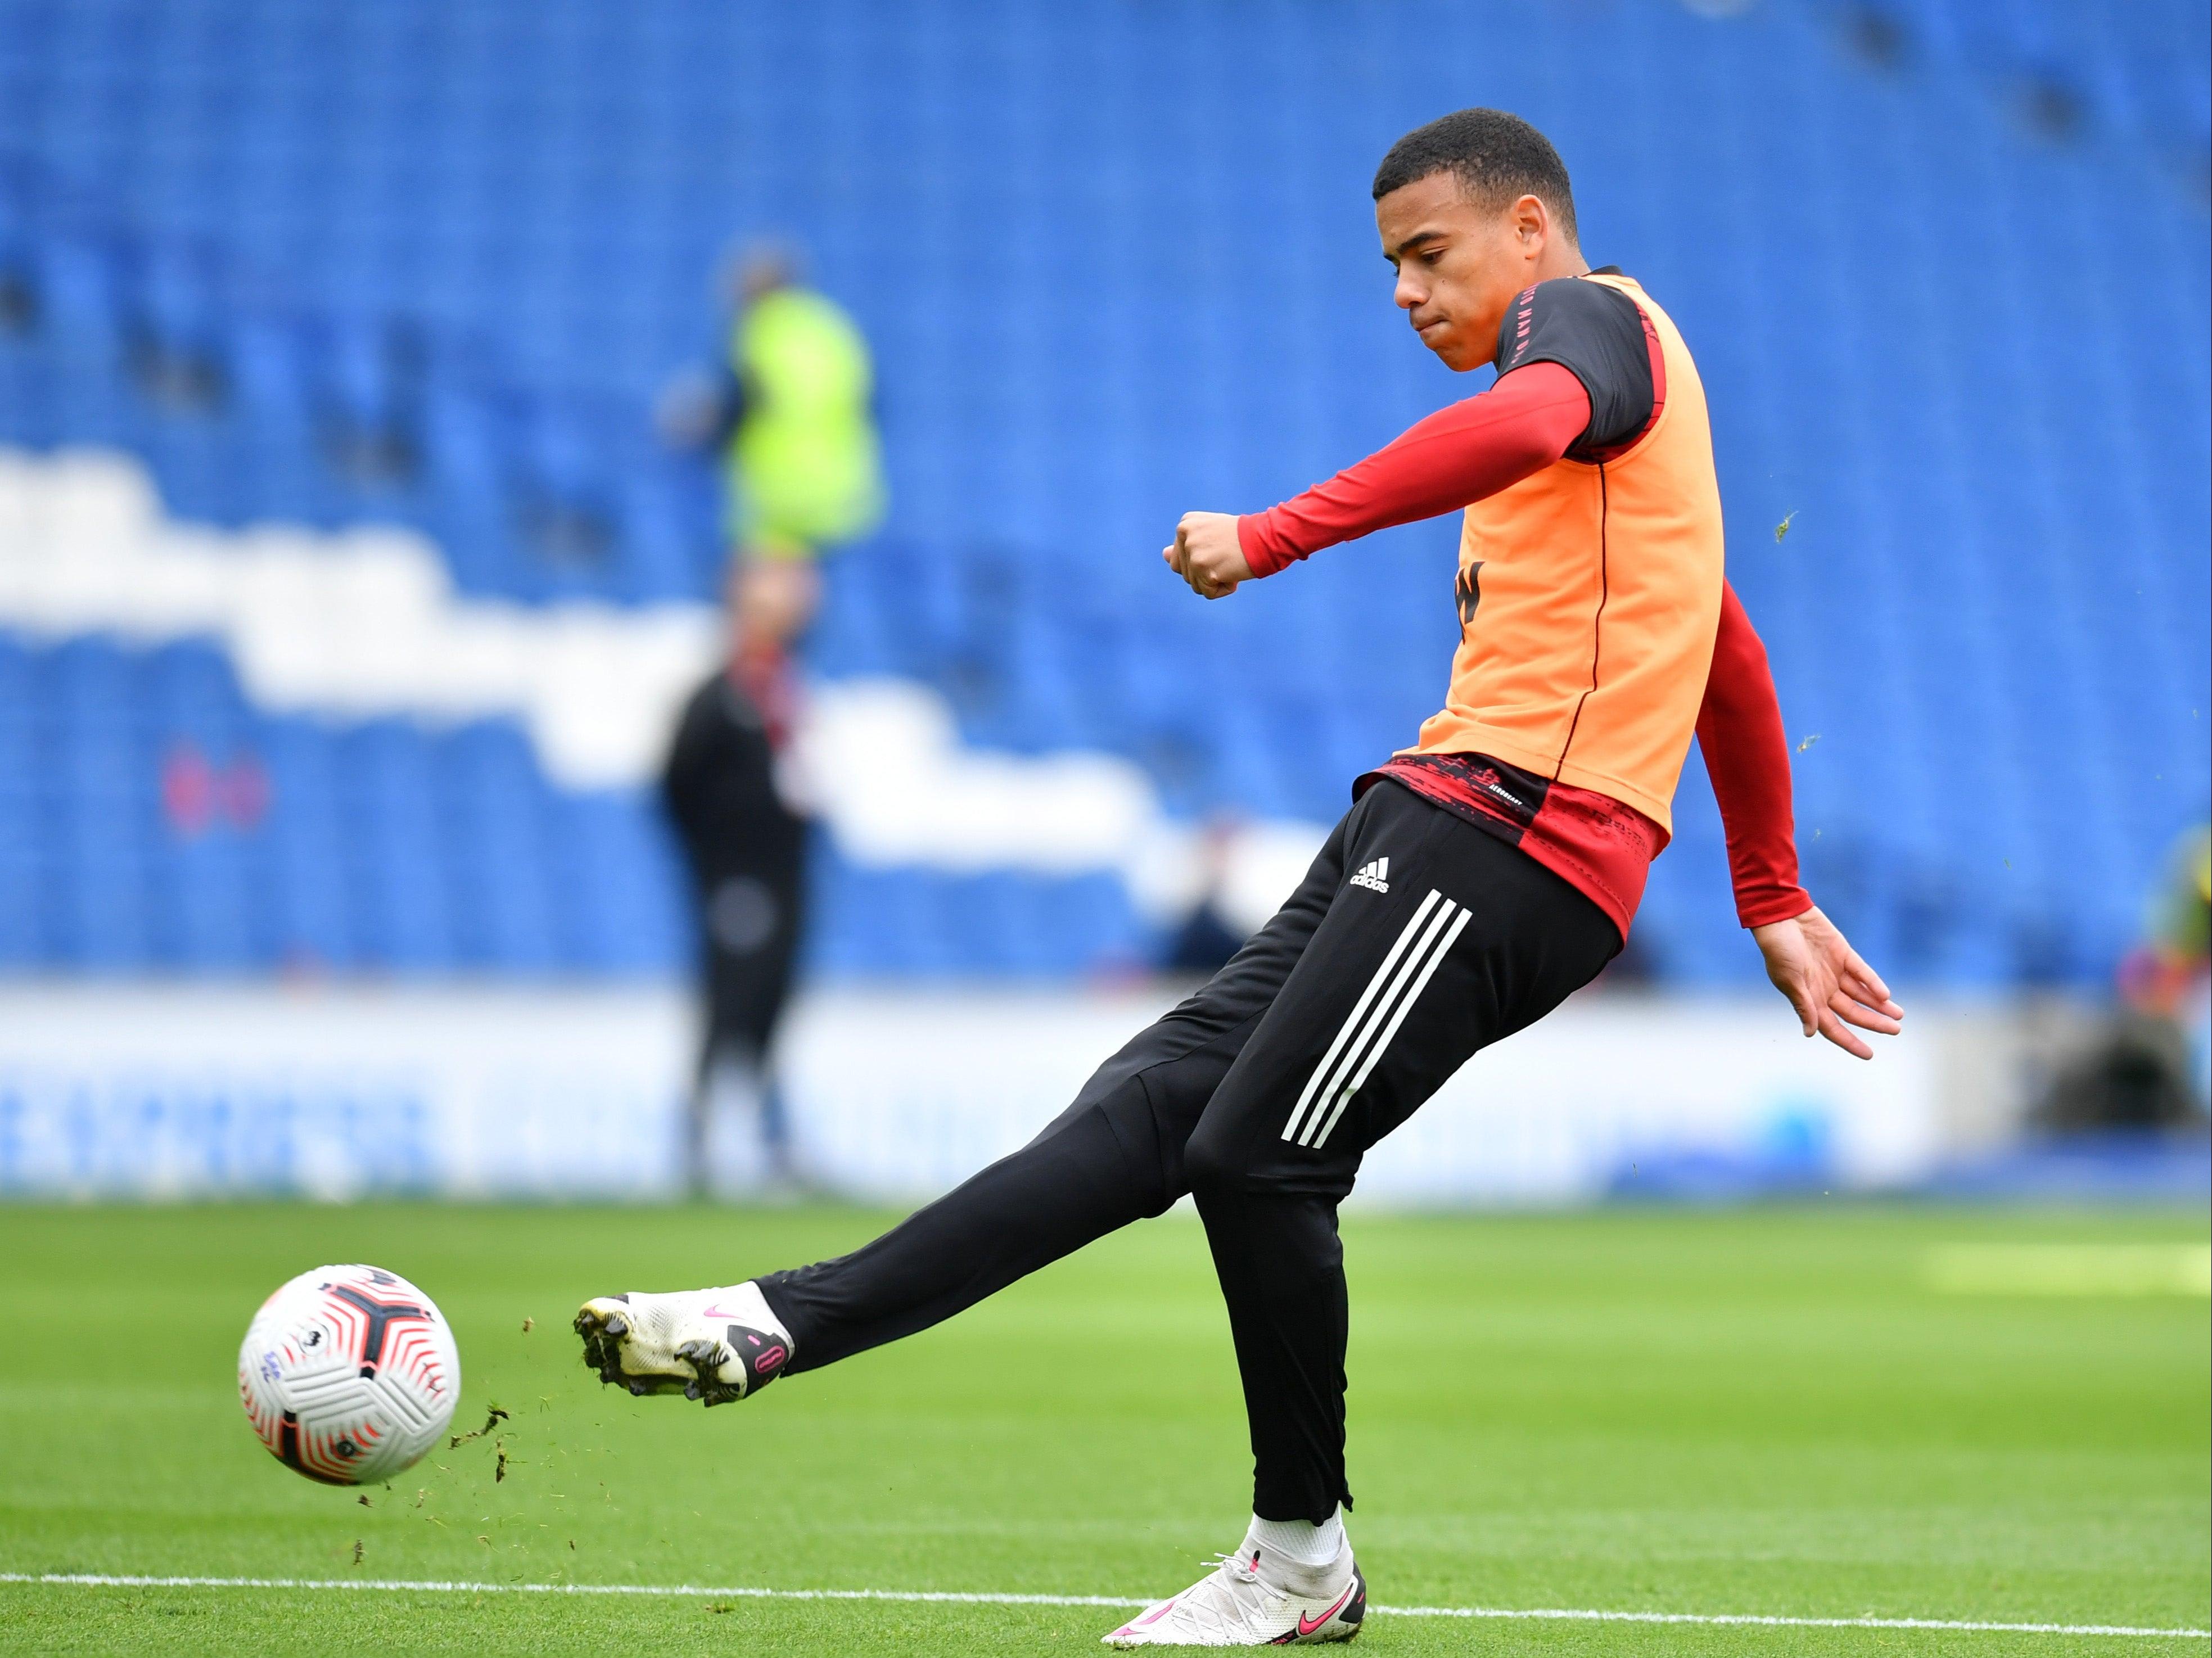 independent.co.uk - Emmet Gates - Brighton vs Manchester United LIVE - Latest updates